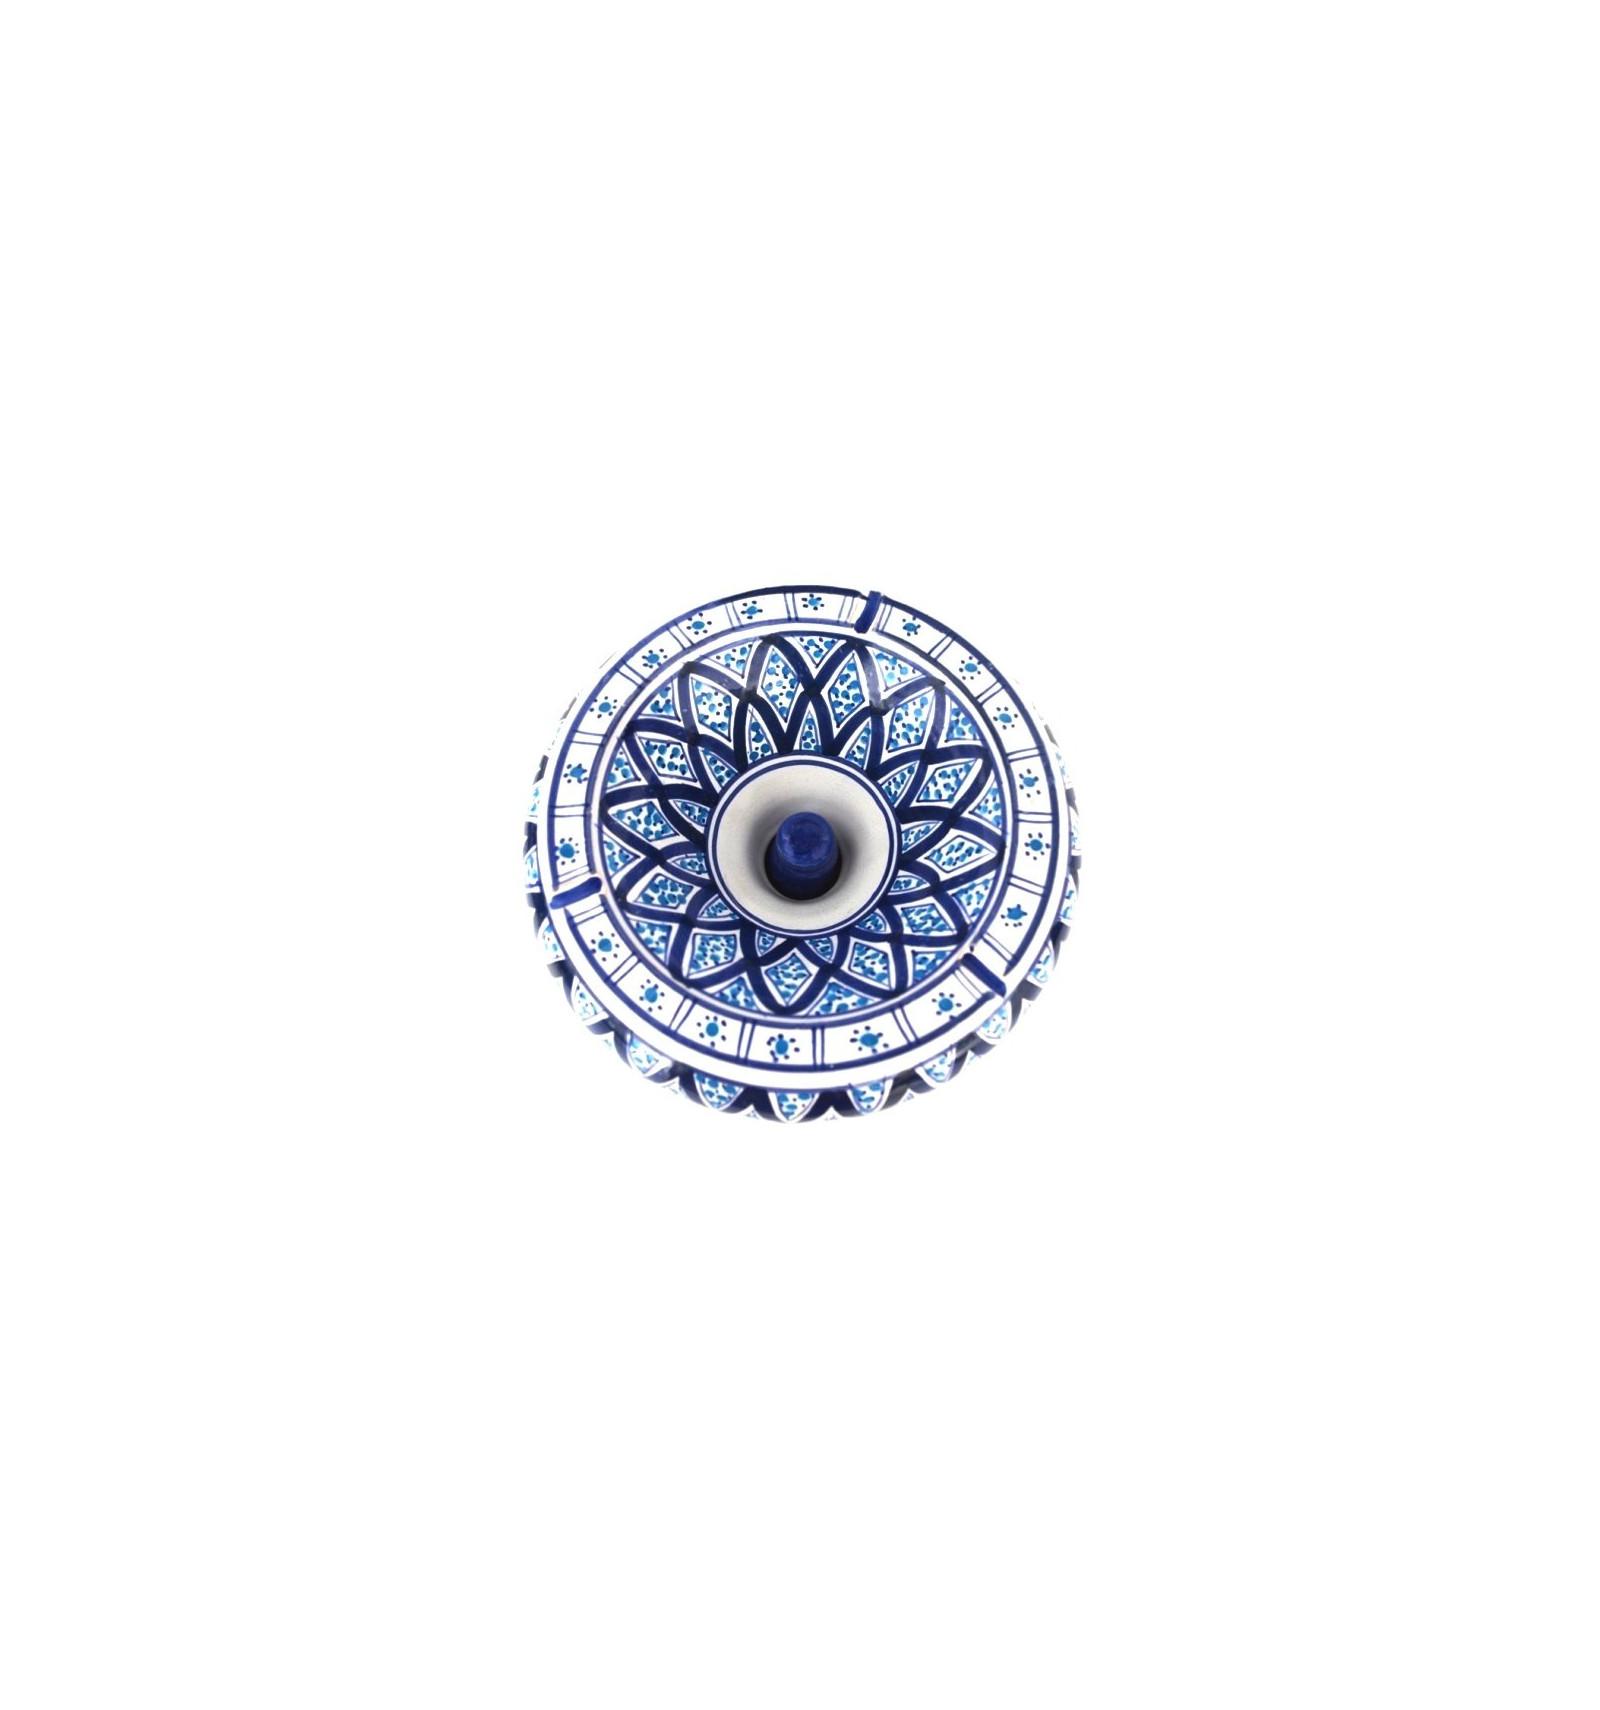 cendrier marocain grande taille latest cendrier marocain en cramique bleu with cendrier. Black Bedroom Furniture Sets. Home Design Ideas